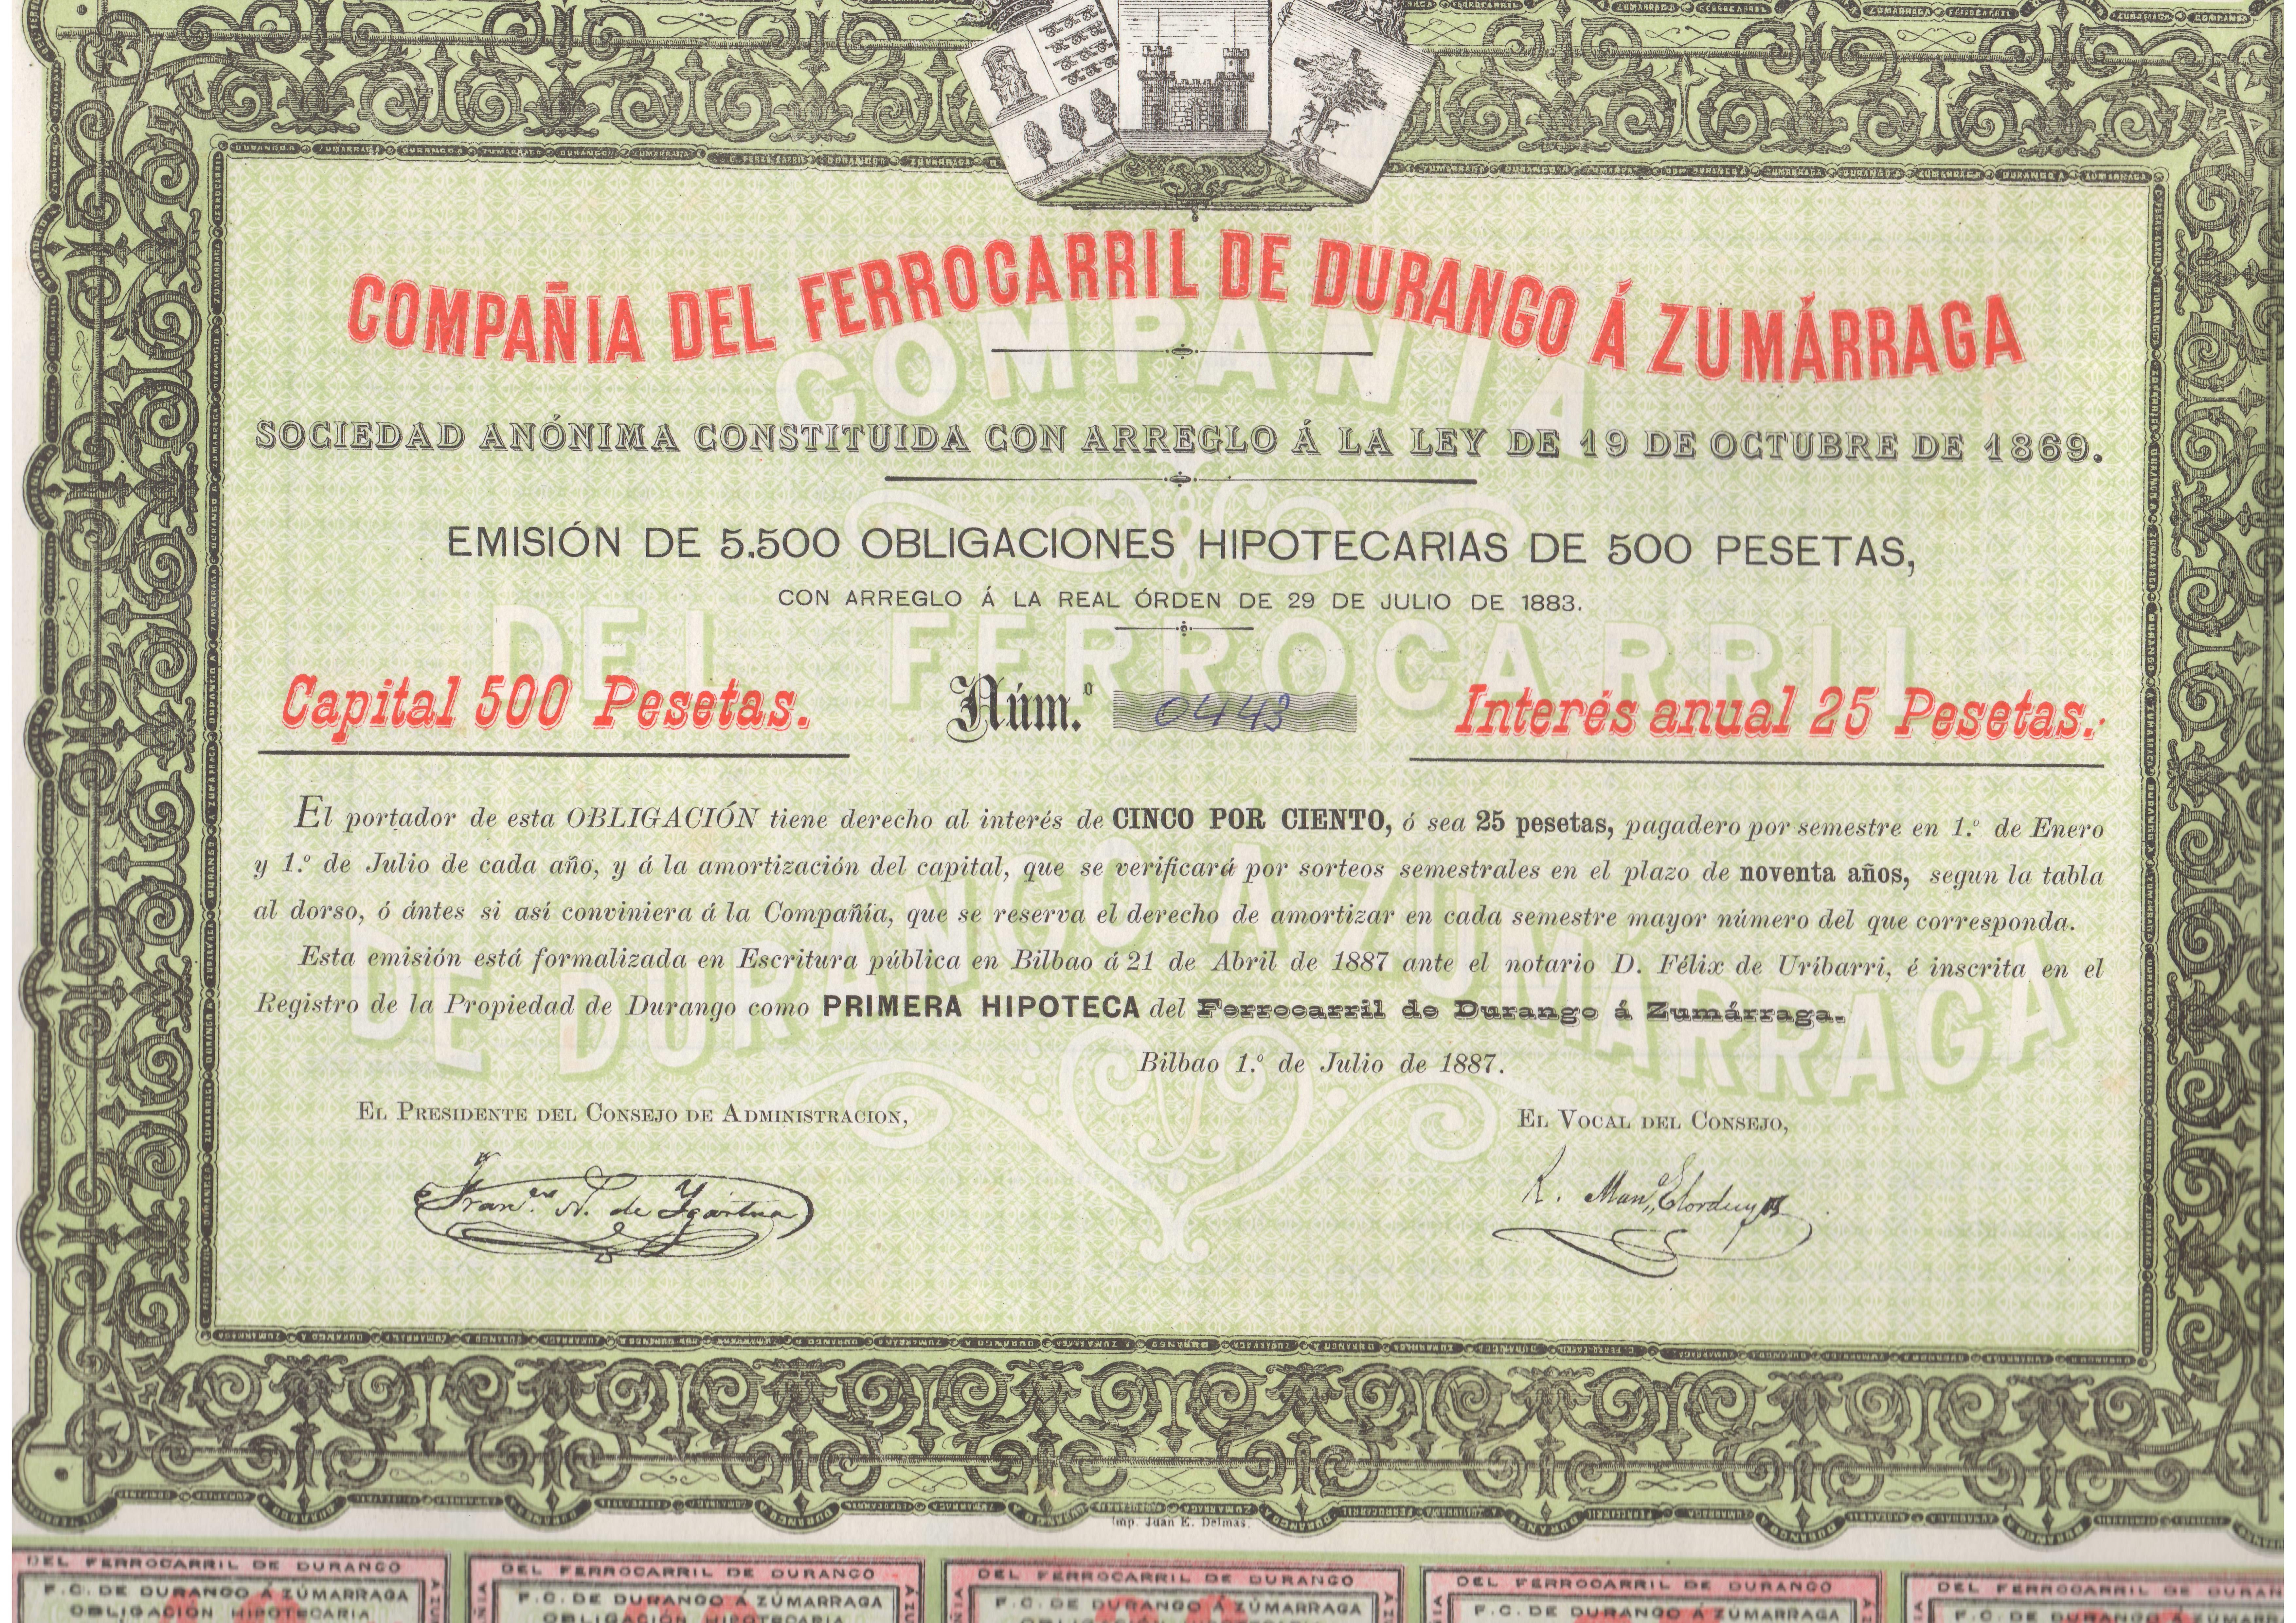 Compañía del Ferrocarril de Durango a Zumárraga